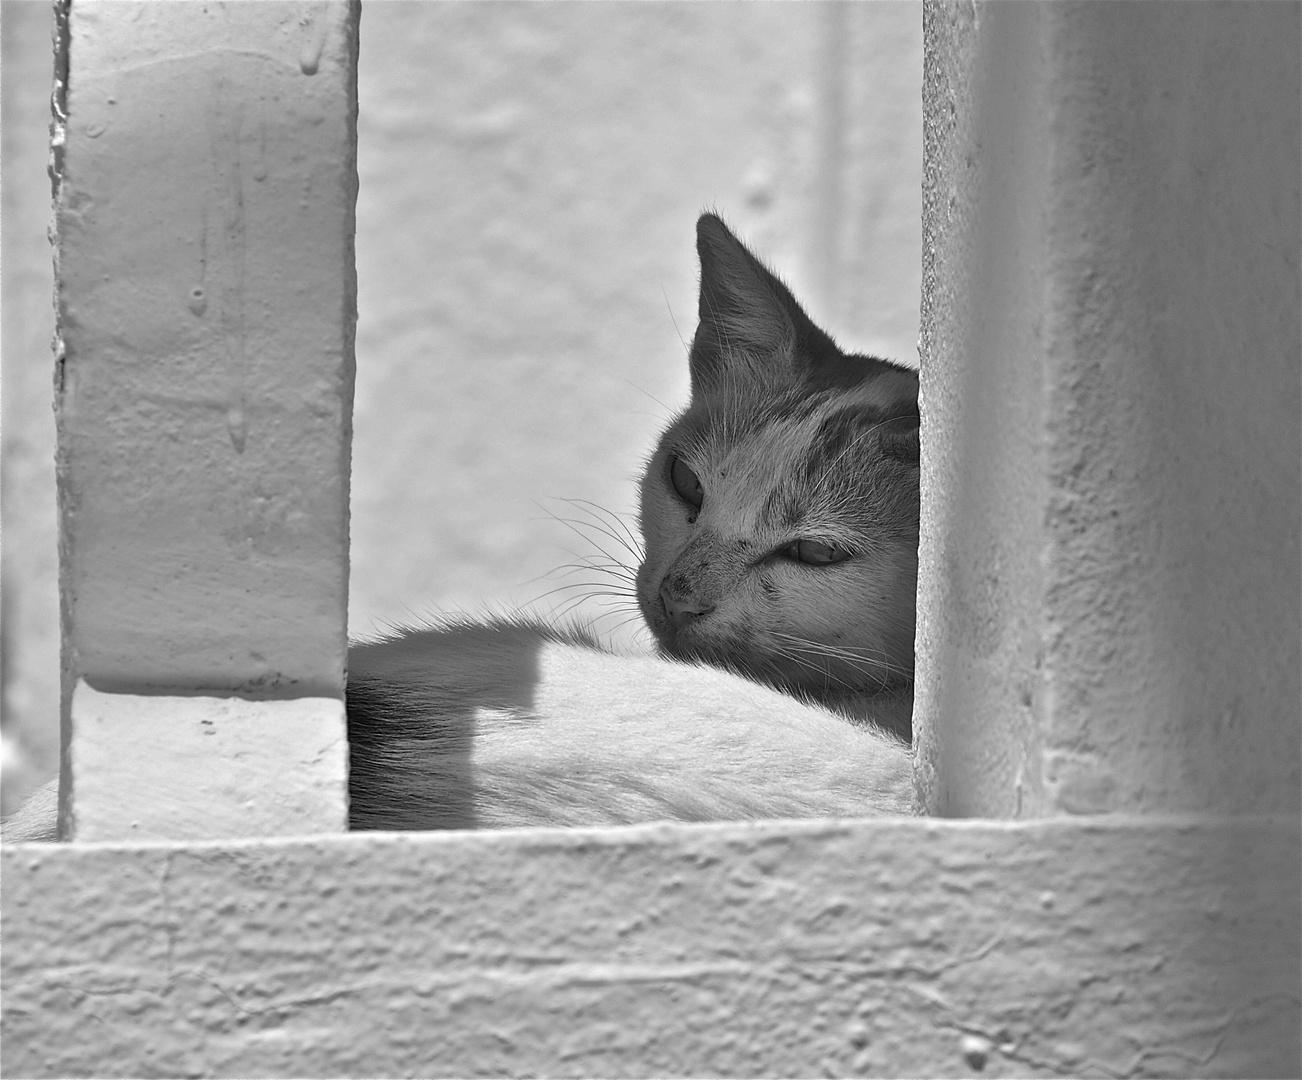 cats of karpathos